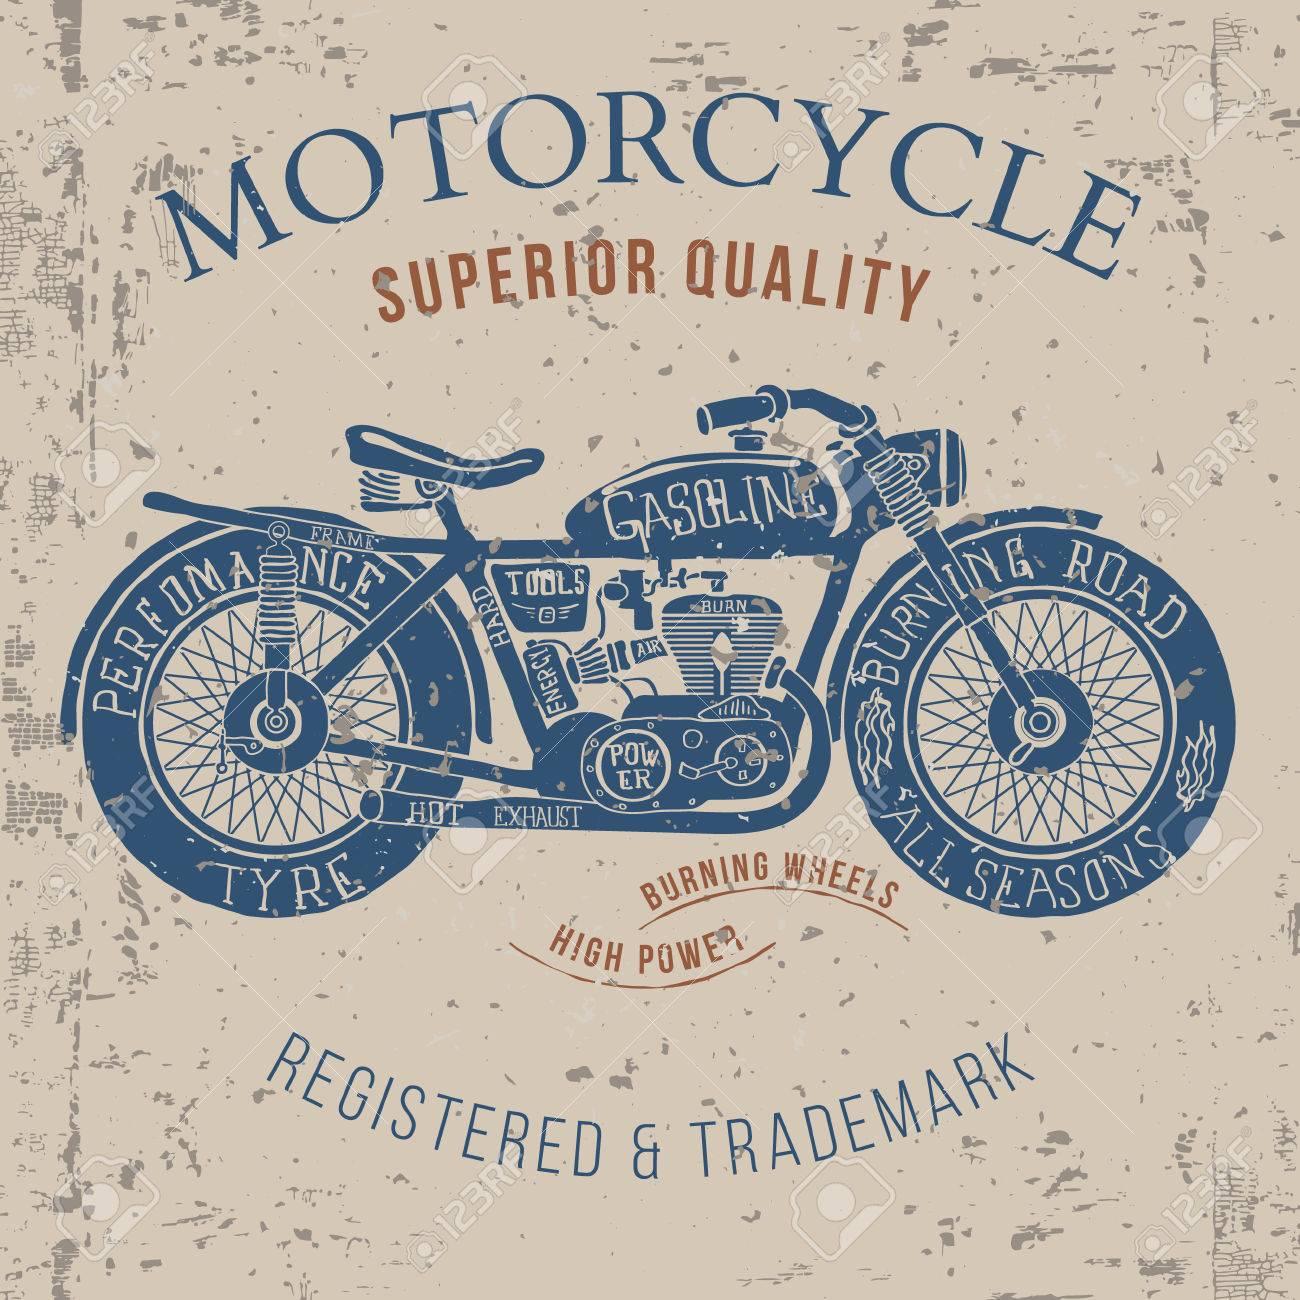 6a077a115557d Vintage Motorrad-Design für T-Shirt-Grafik-Druck Vektor-Illustration  Standard